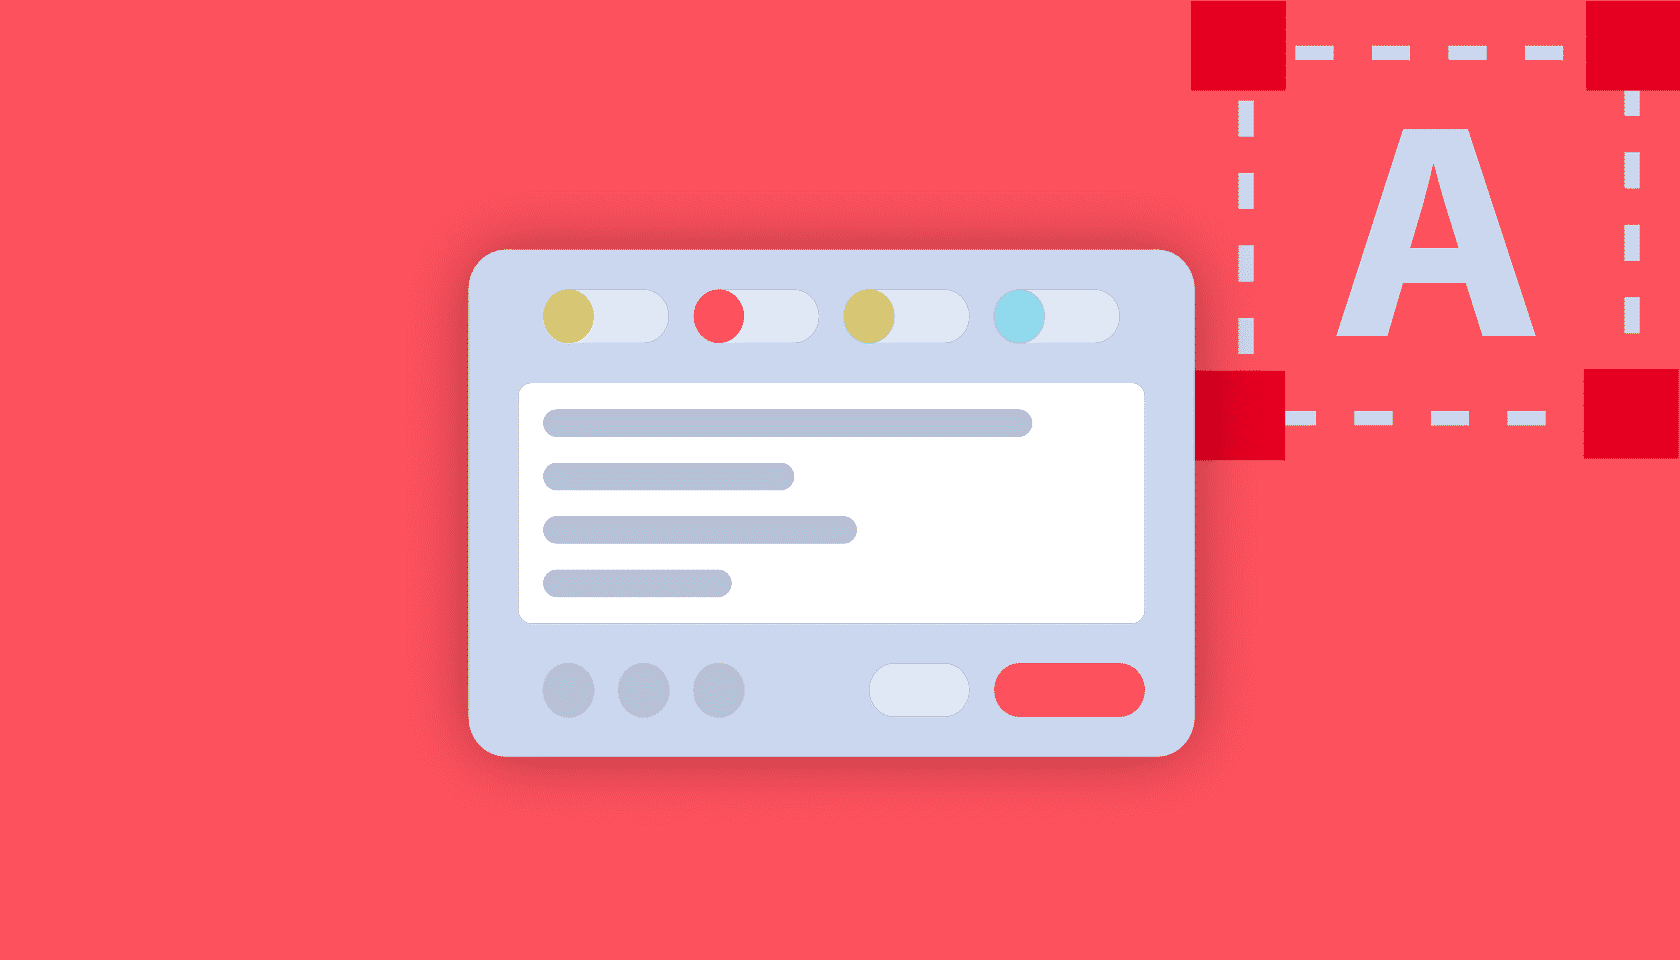 TinyMCE Advanced: The Most Powerful WYSIWYG HTML Editor For WordPress